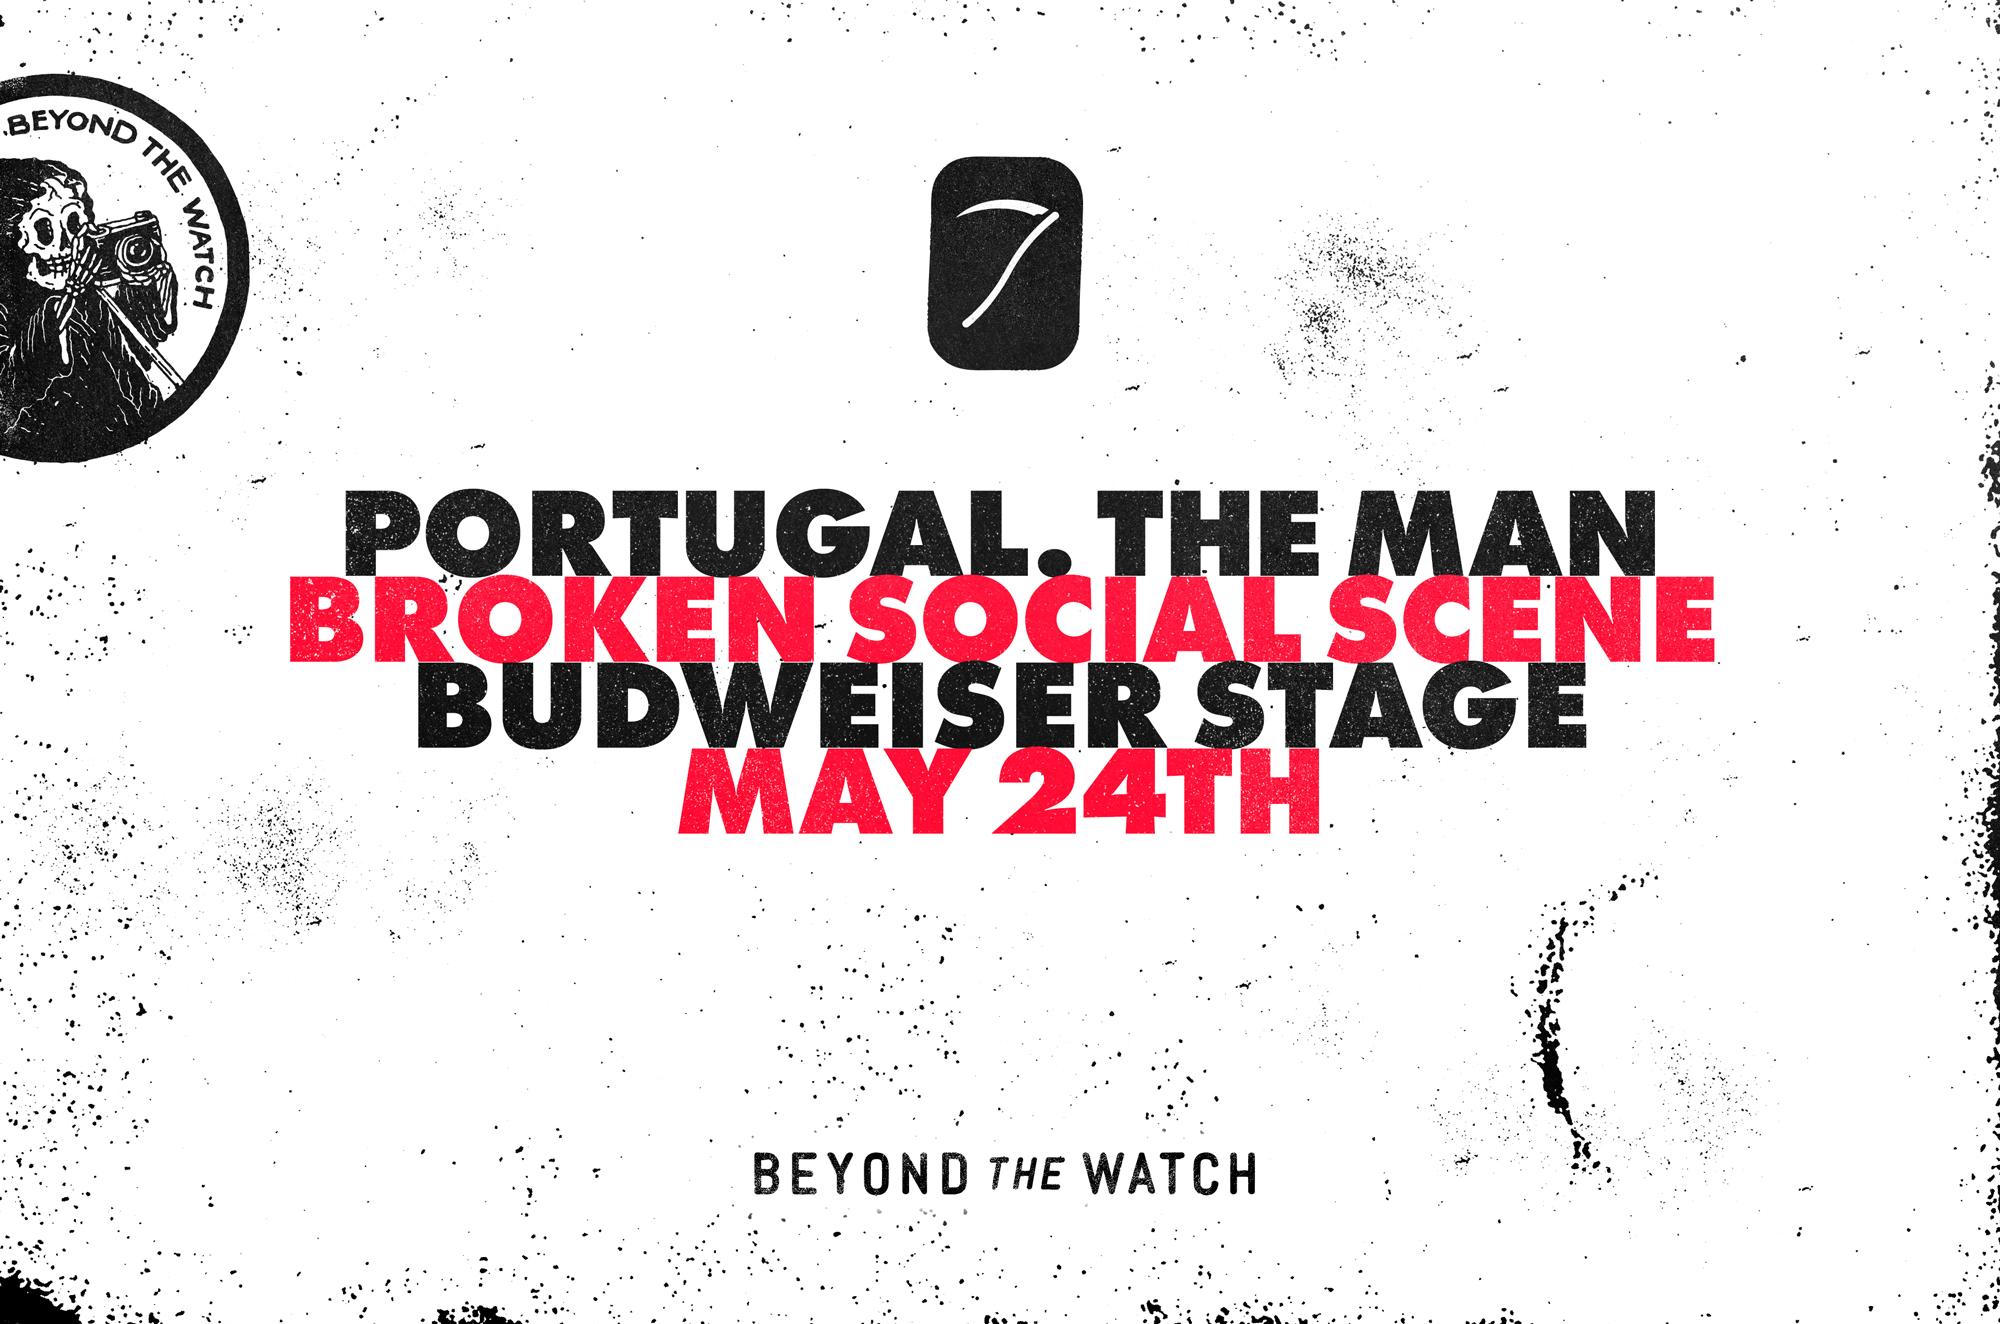 PortugalTheMan.jpg